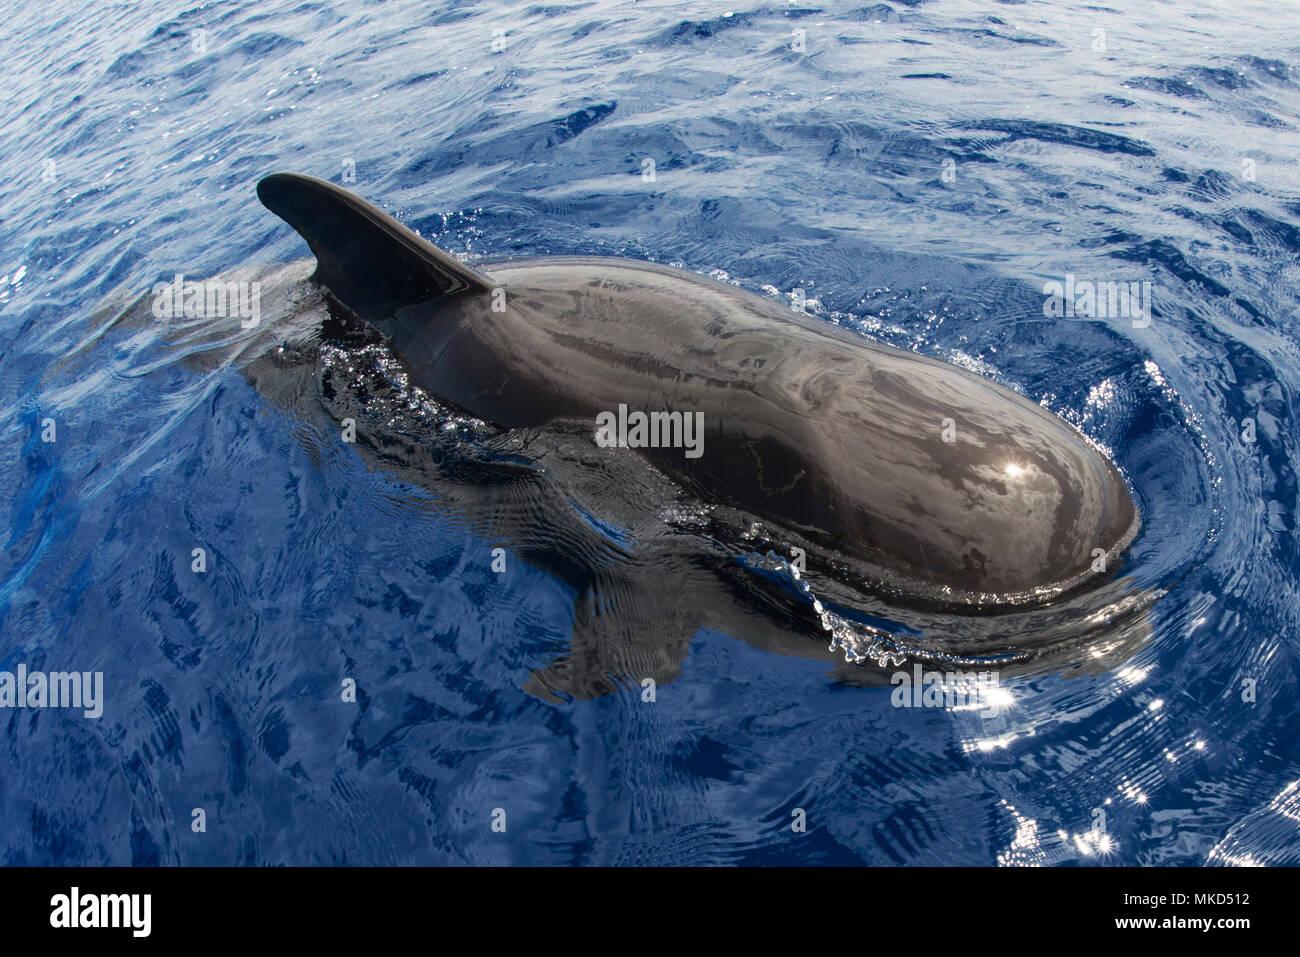 Pilot whale (Globicephala macorhynchus) on surface. Tenerife, Canary Islands. - Stock Image